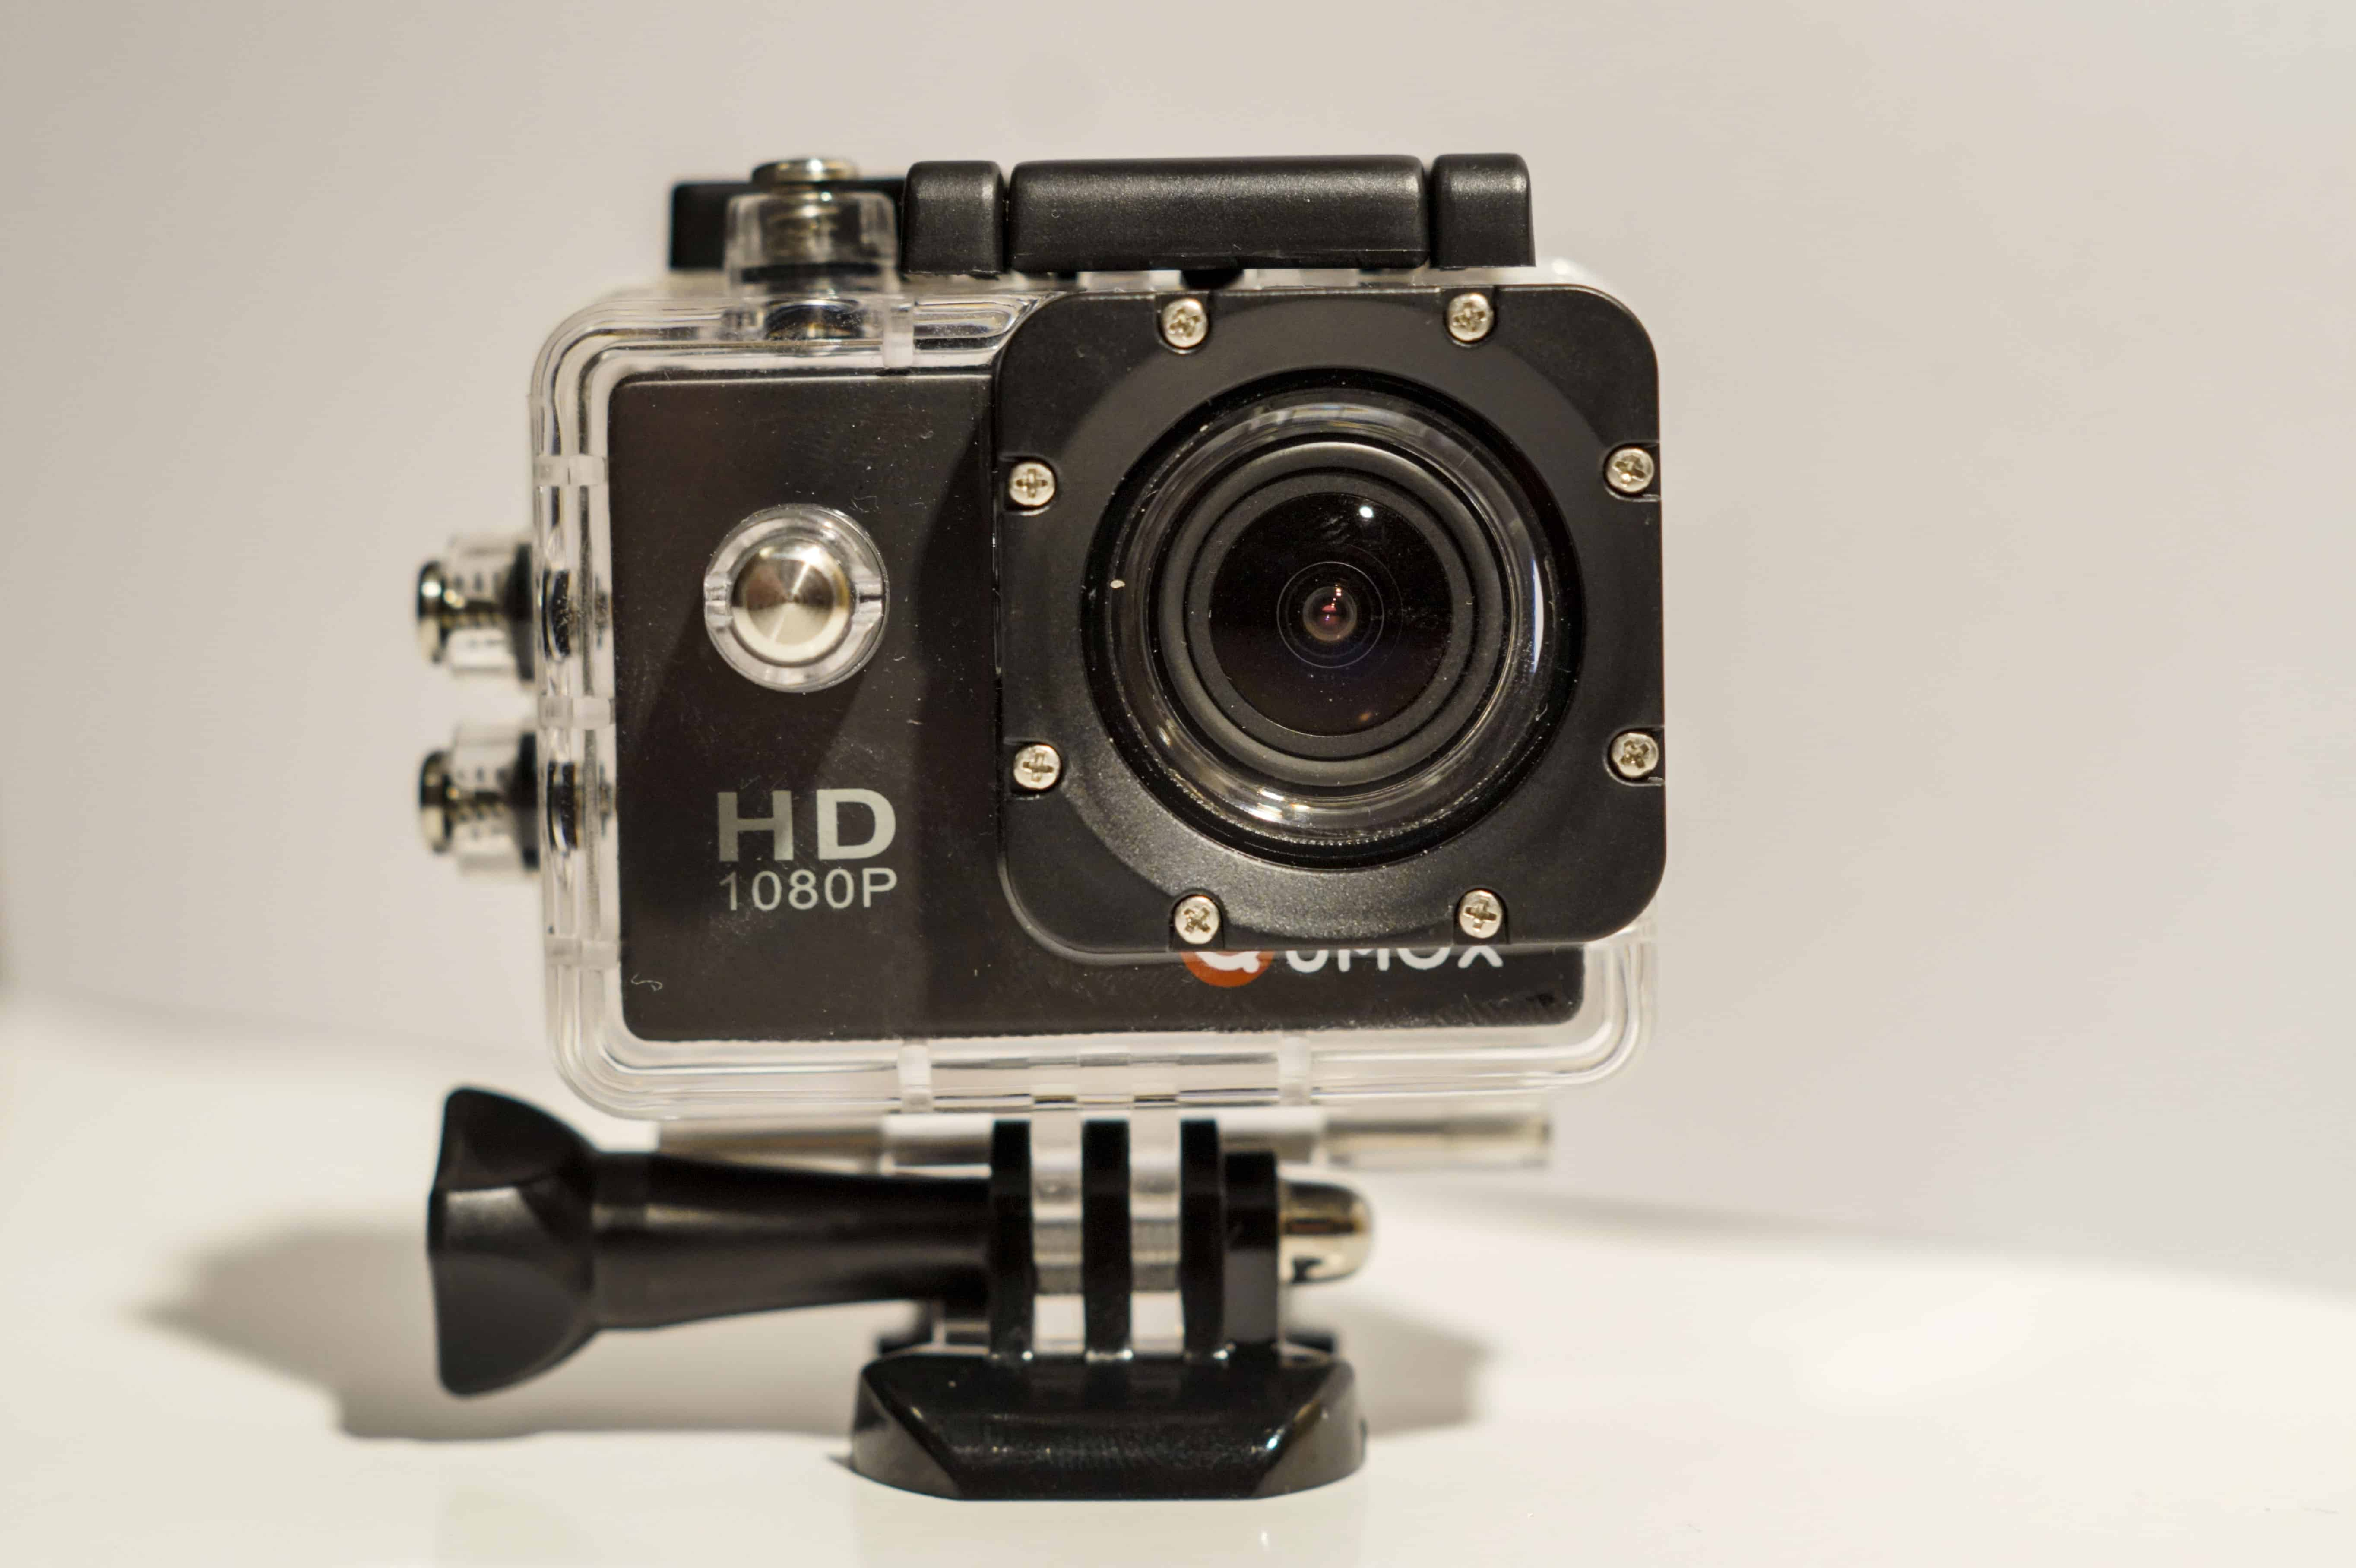 qumox sj4000 die gopro alternative im action kamera test. Black Bedroom Furniture Sets. Home Design Ideas